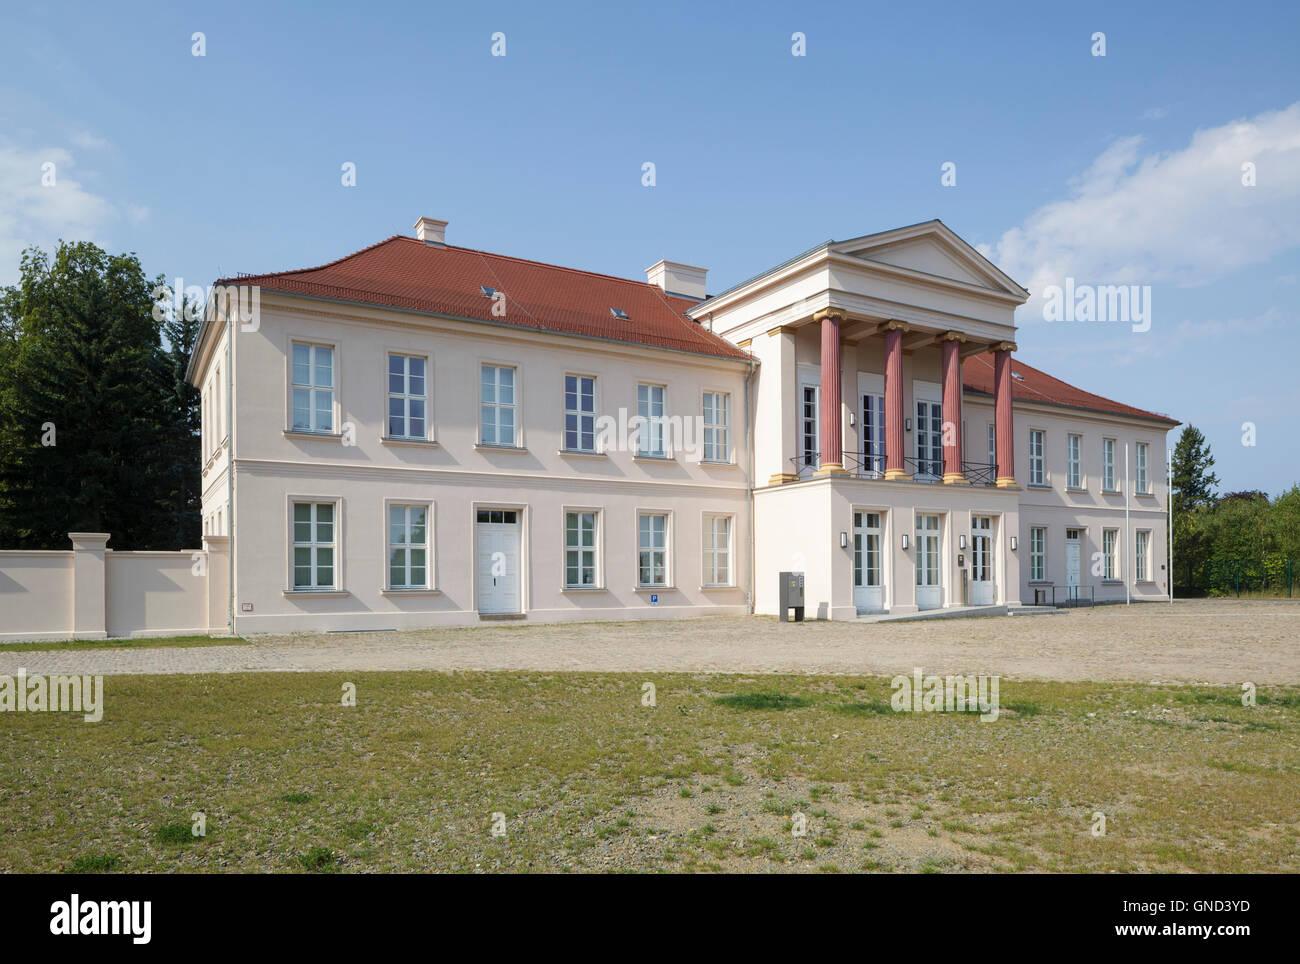 Kavaliershaus on the Schlossberg, Neustrelitz, Mecklenburg-Vorpommern, Germany Stock Photo